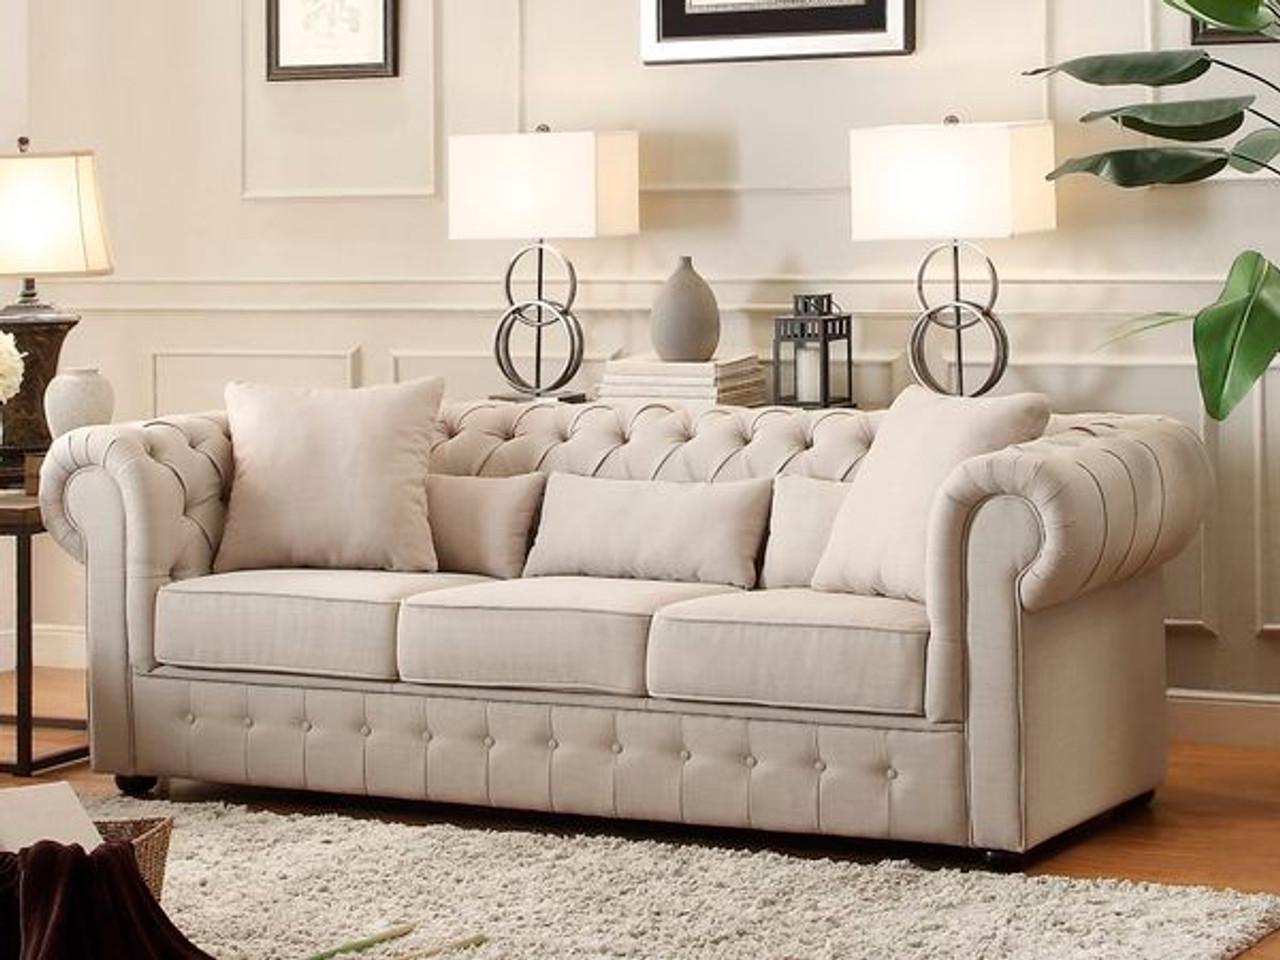 Homelegance Grand Chesterfield Sofa Upholstered Button